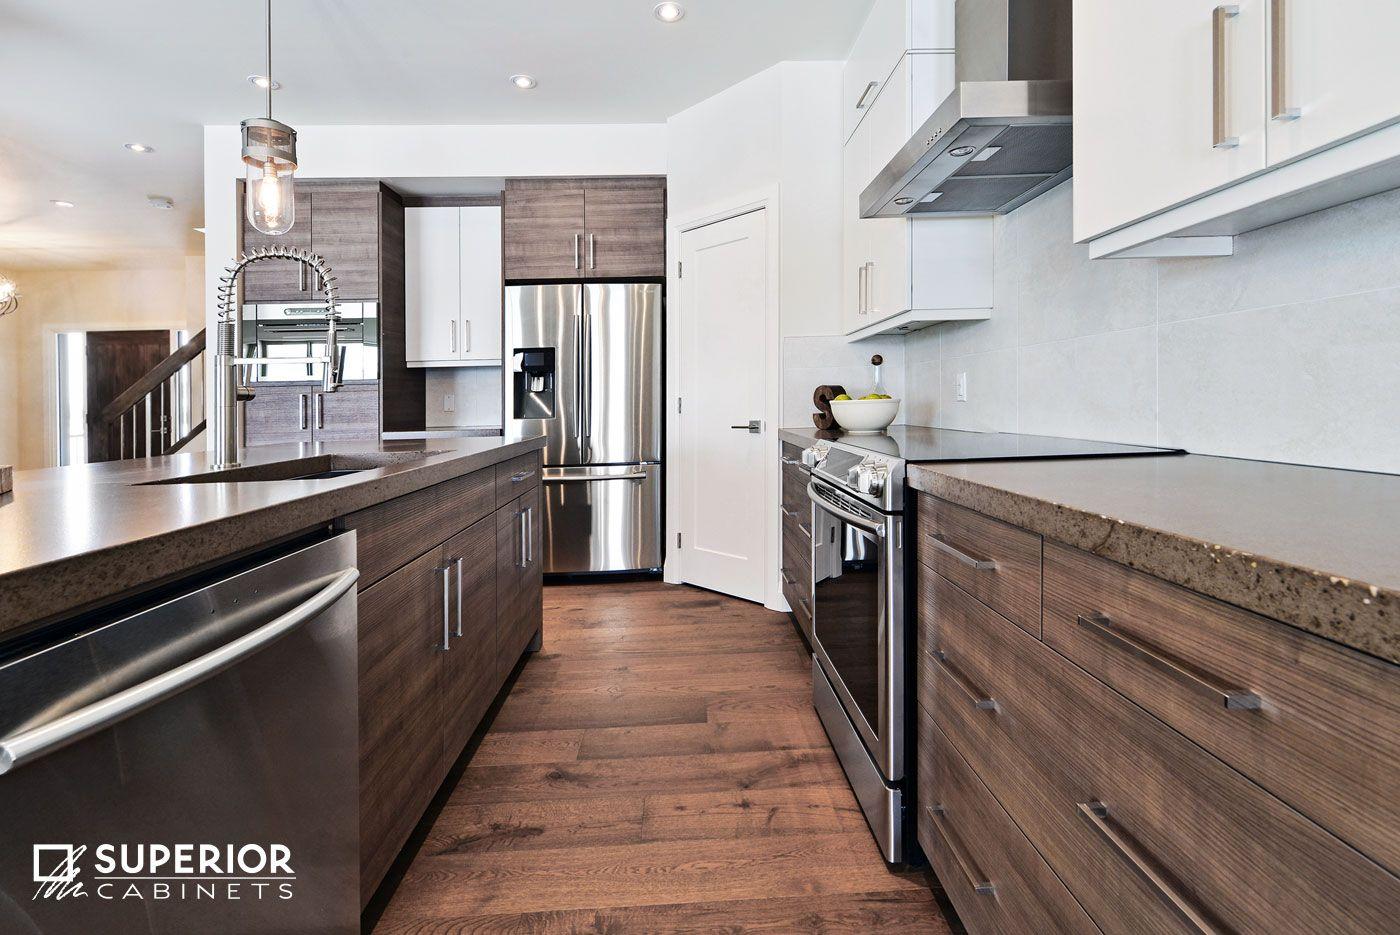 Design By: @wprodaniuk, Superior Cabinets Edmonton; Builder: Remley  Developments; Base